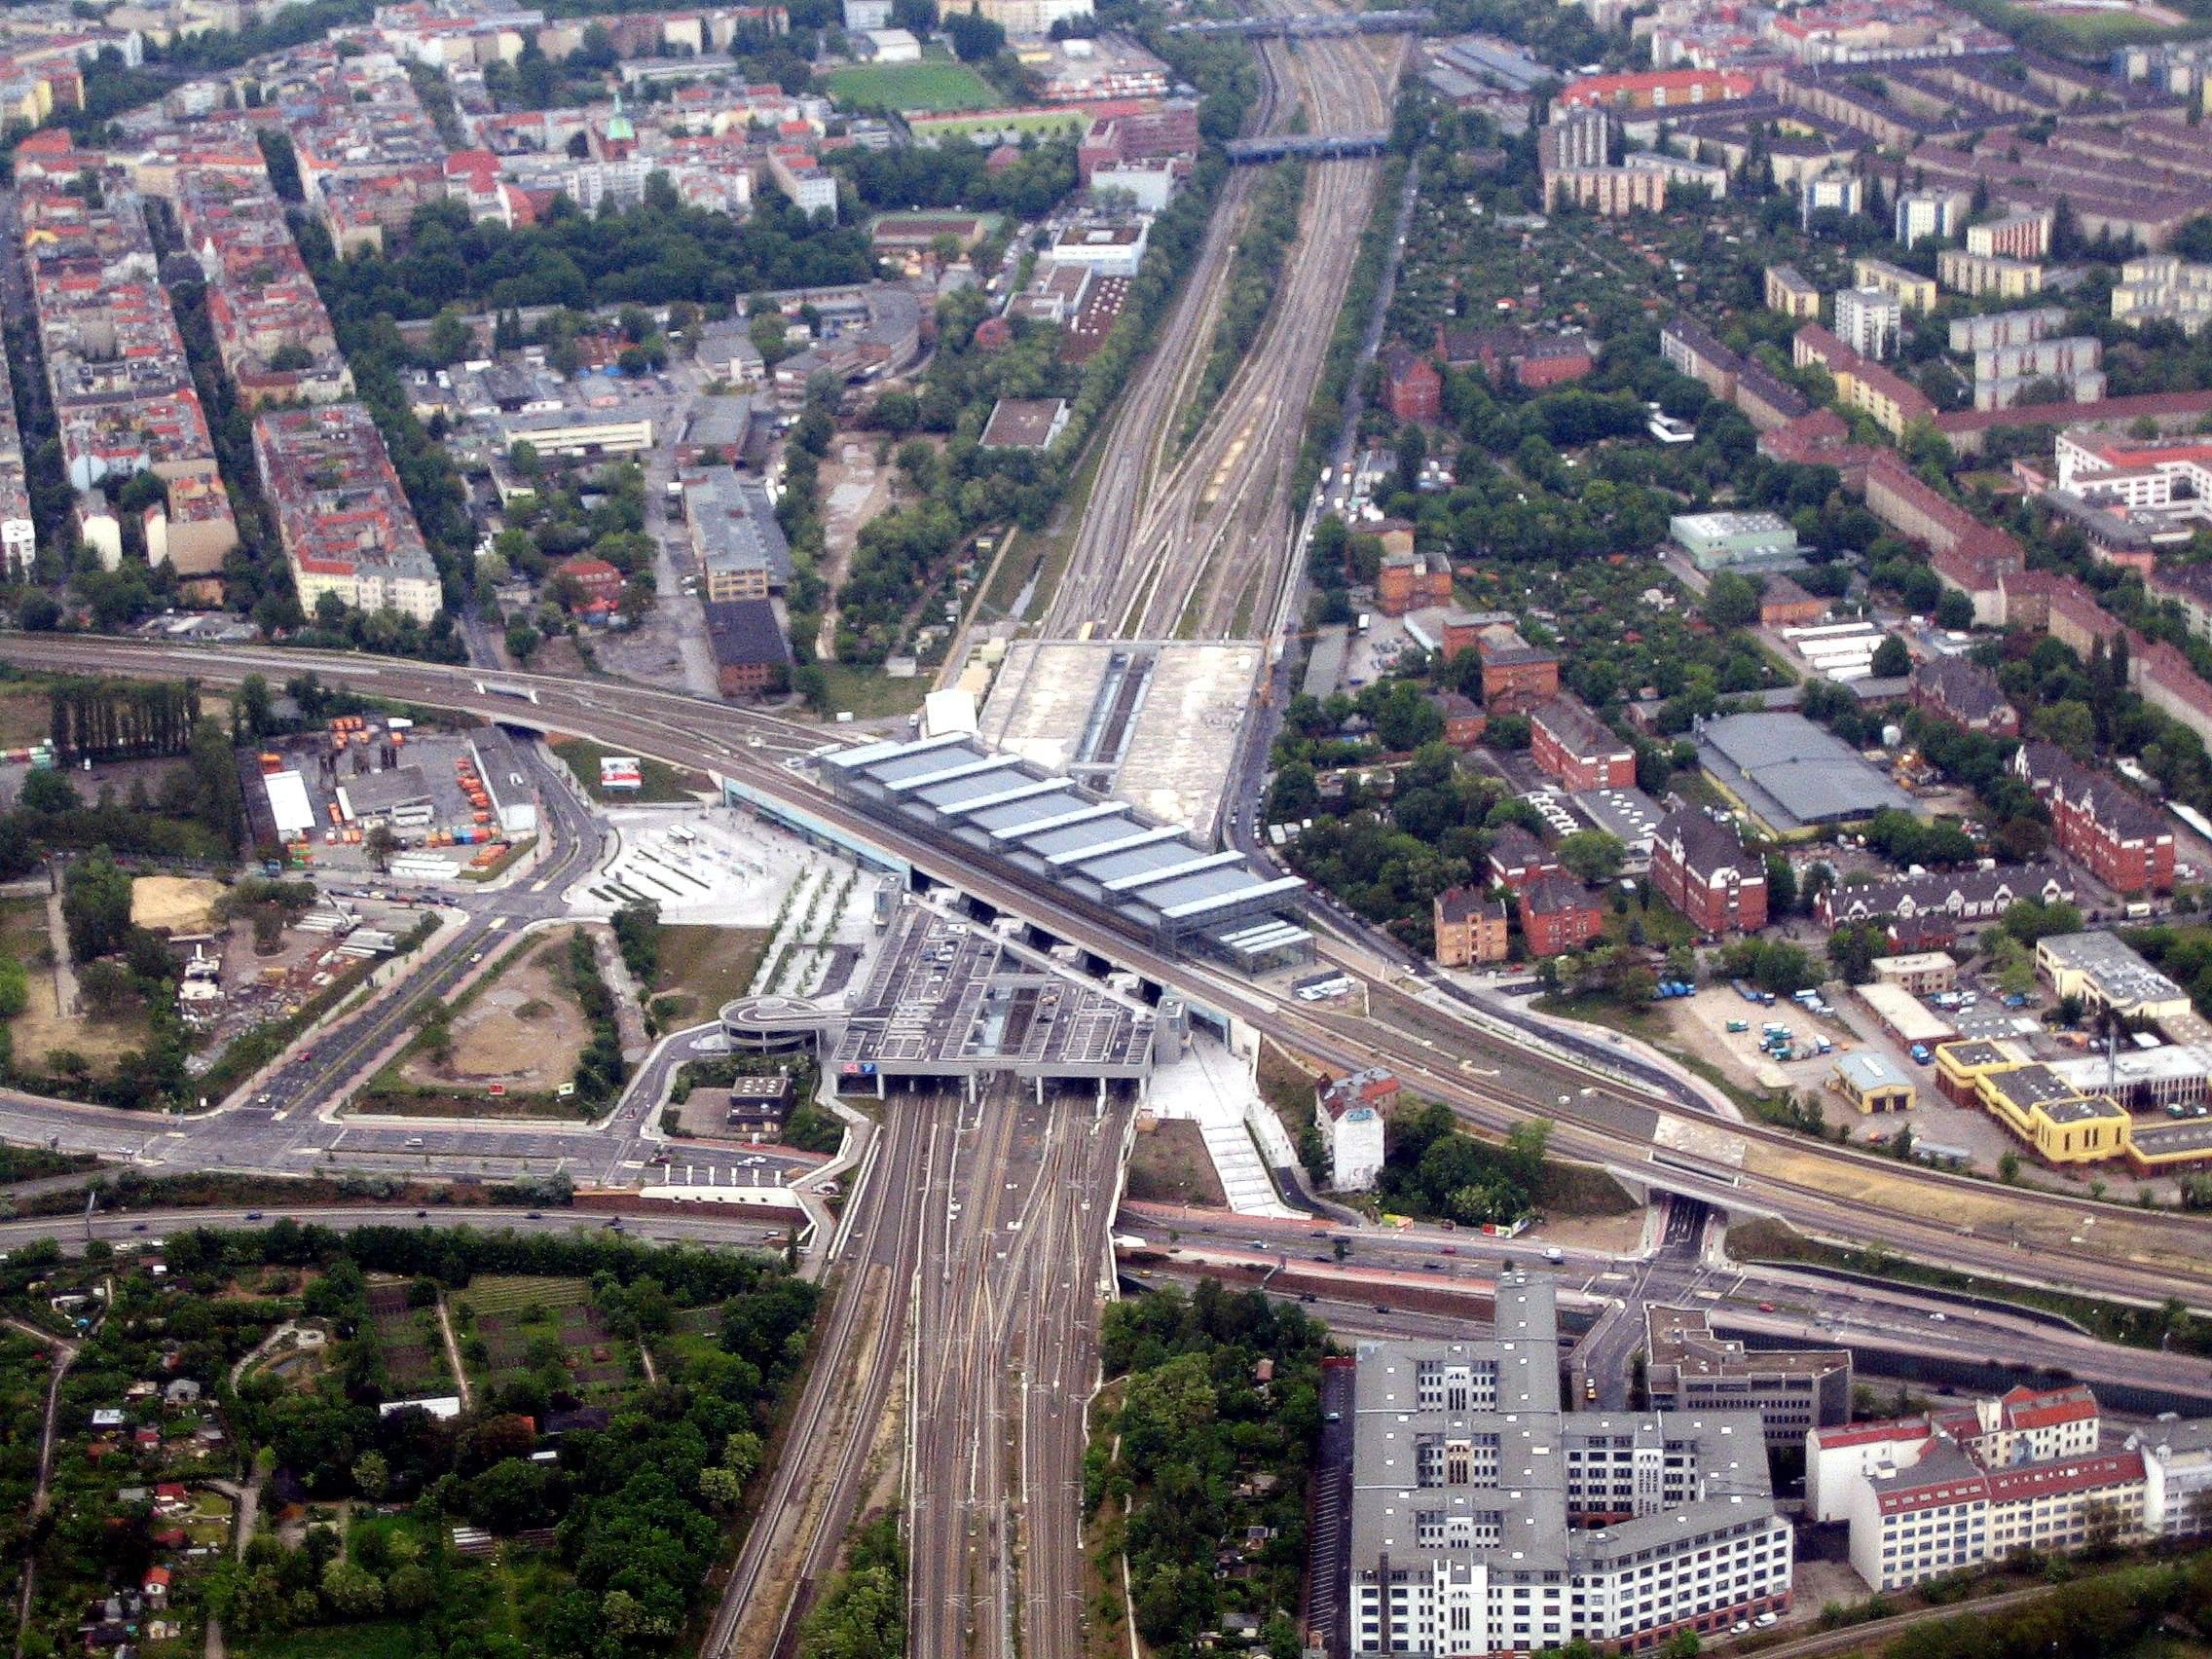 Bahnhof Berlin Südkreuz denis apel JPG